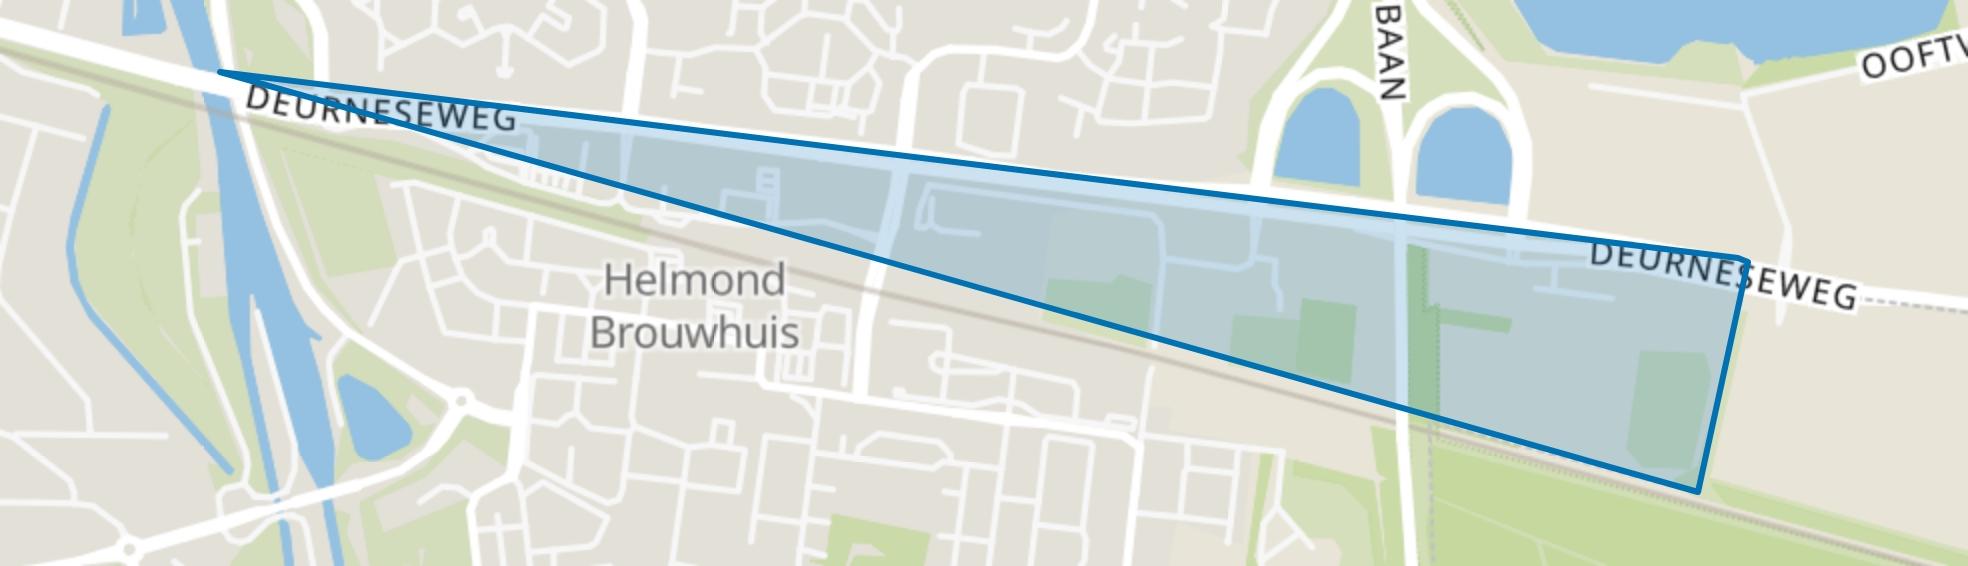 Brouwhorst, Helmond map